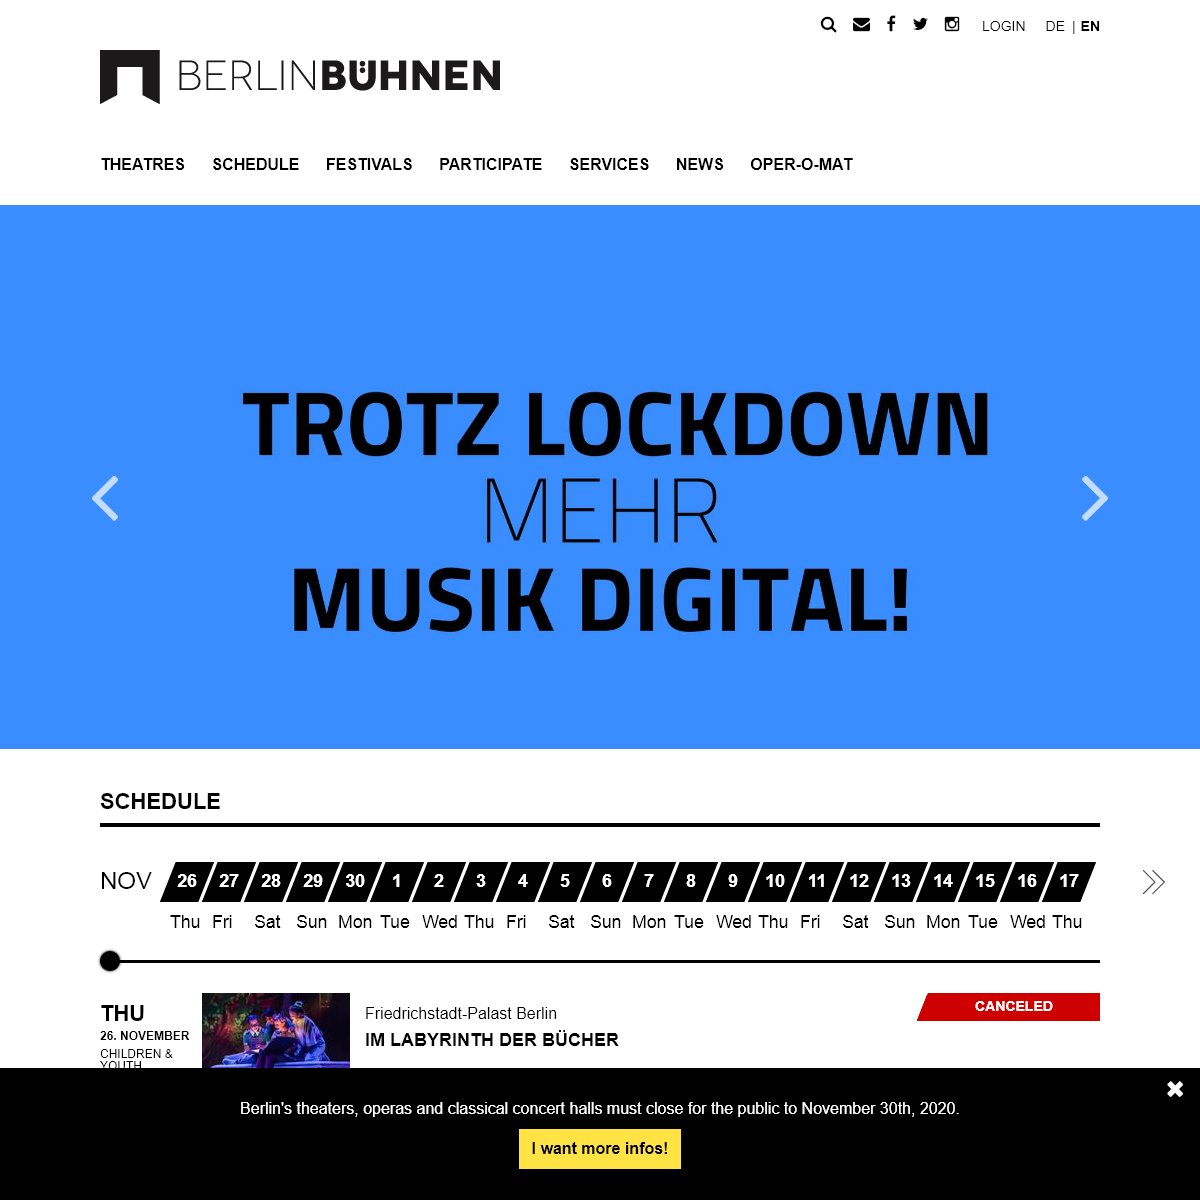 Berlin Bühnen